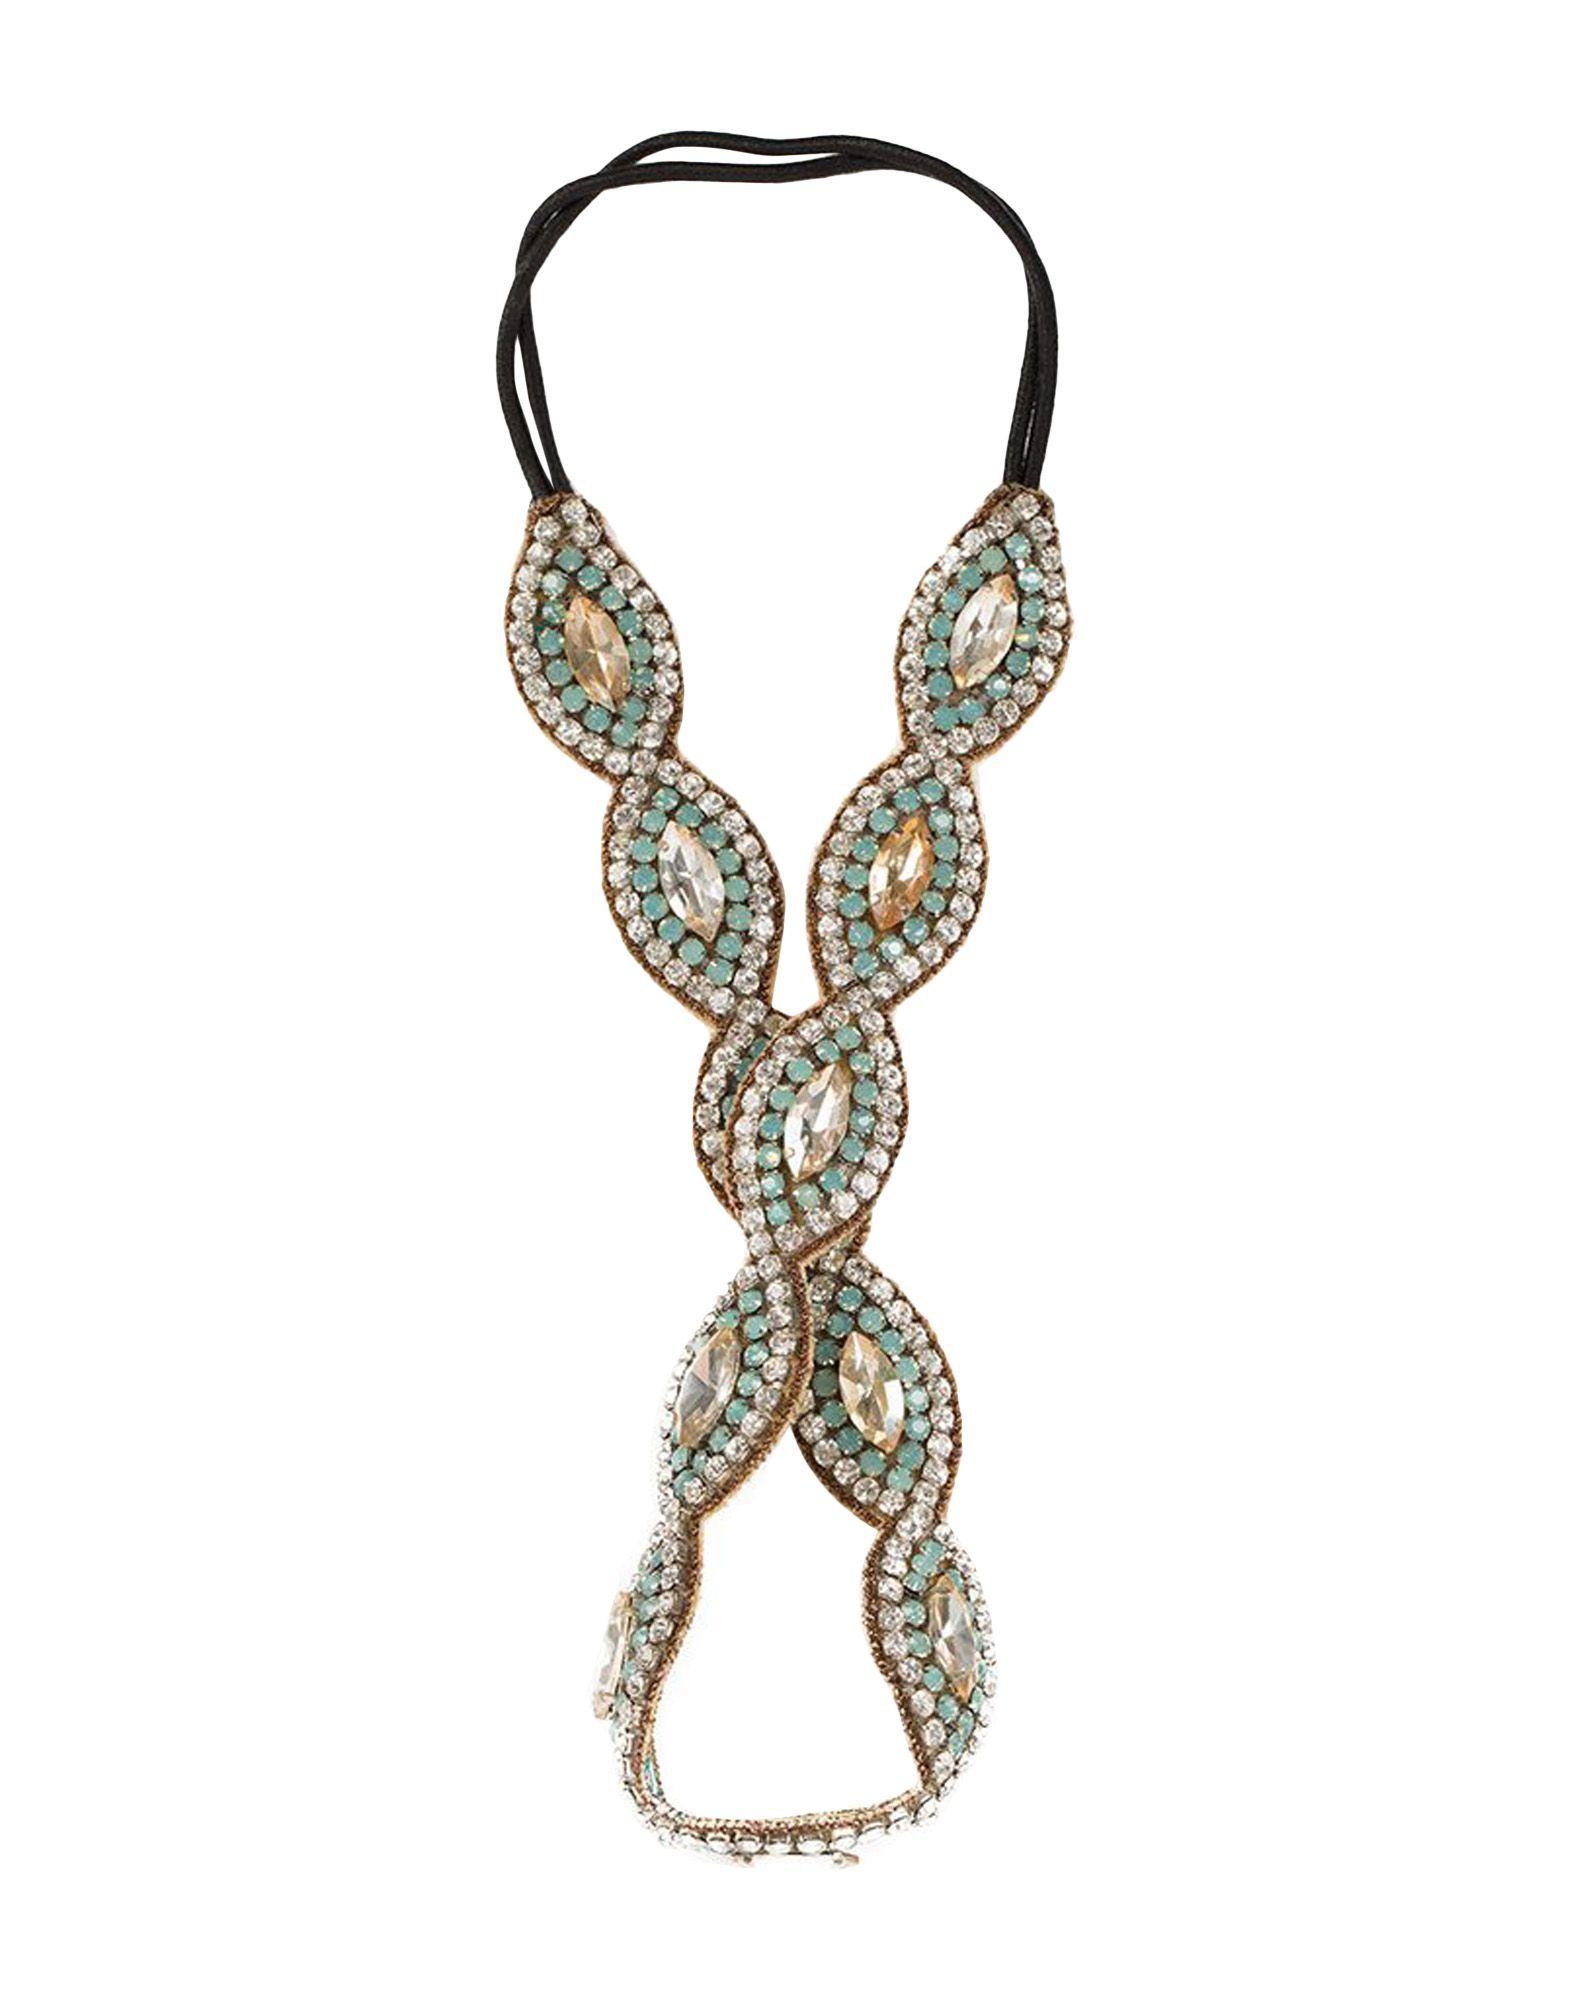 Deepa Gurnani JEWELRY - Earrings su YOOX.COM 2P9VU